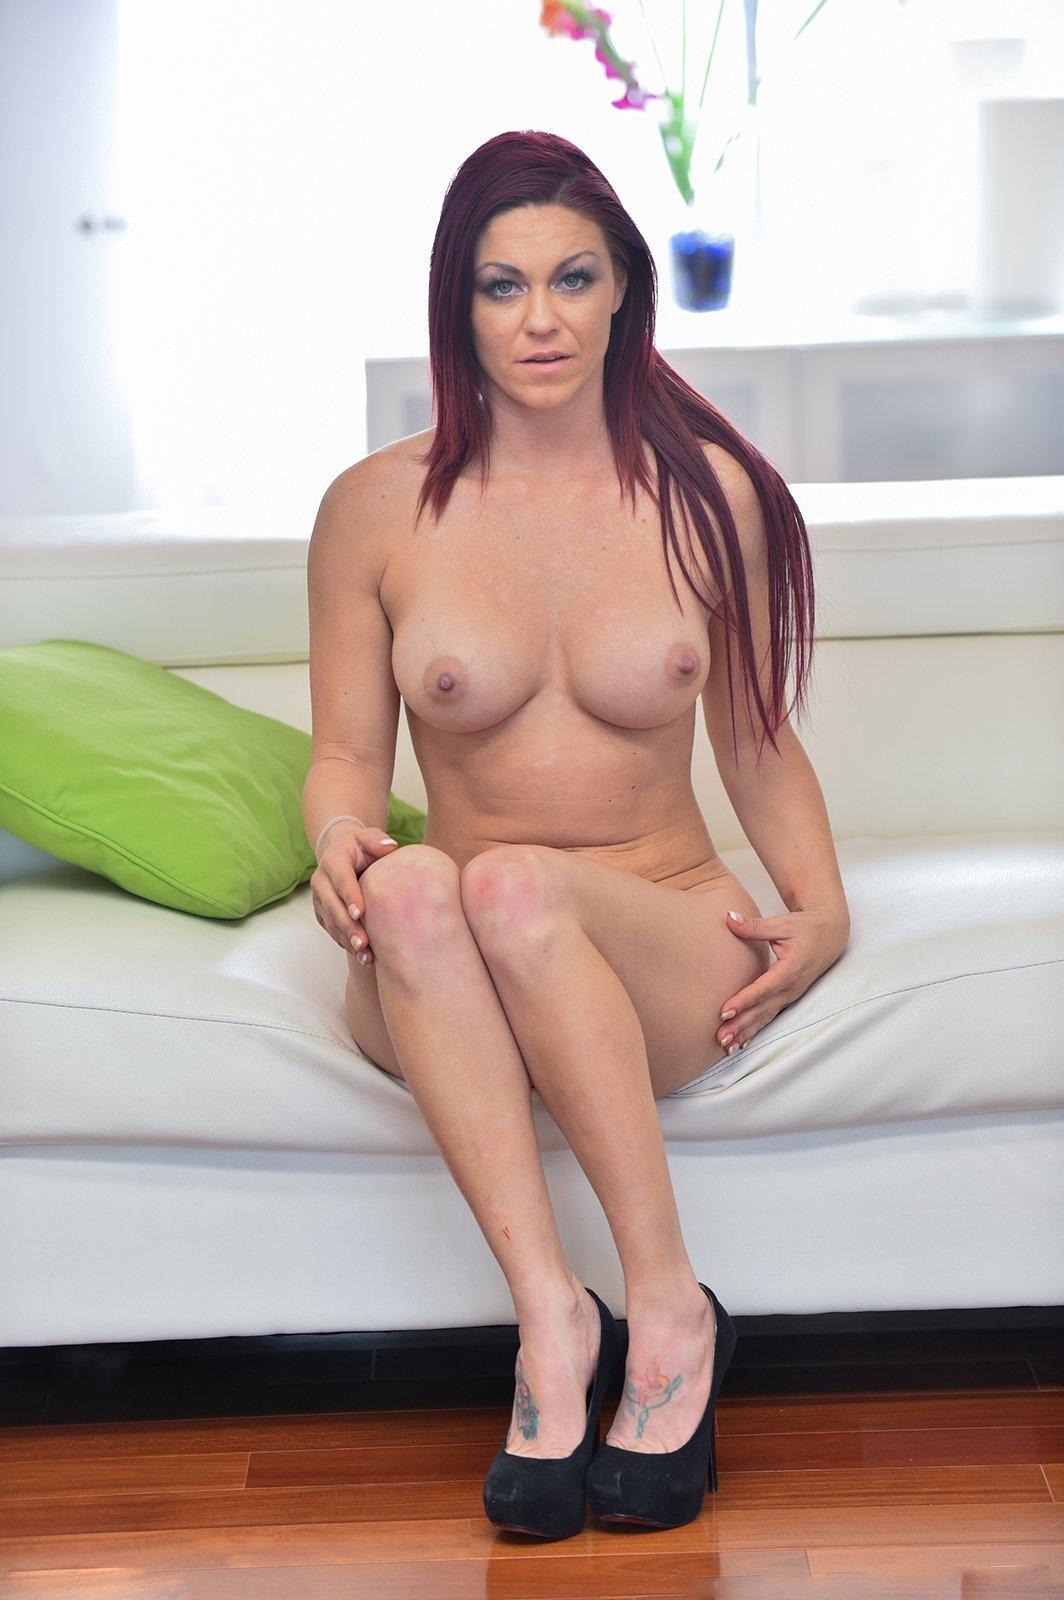 PurpleSugar from Swansea,United Kingdom